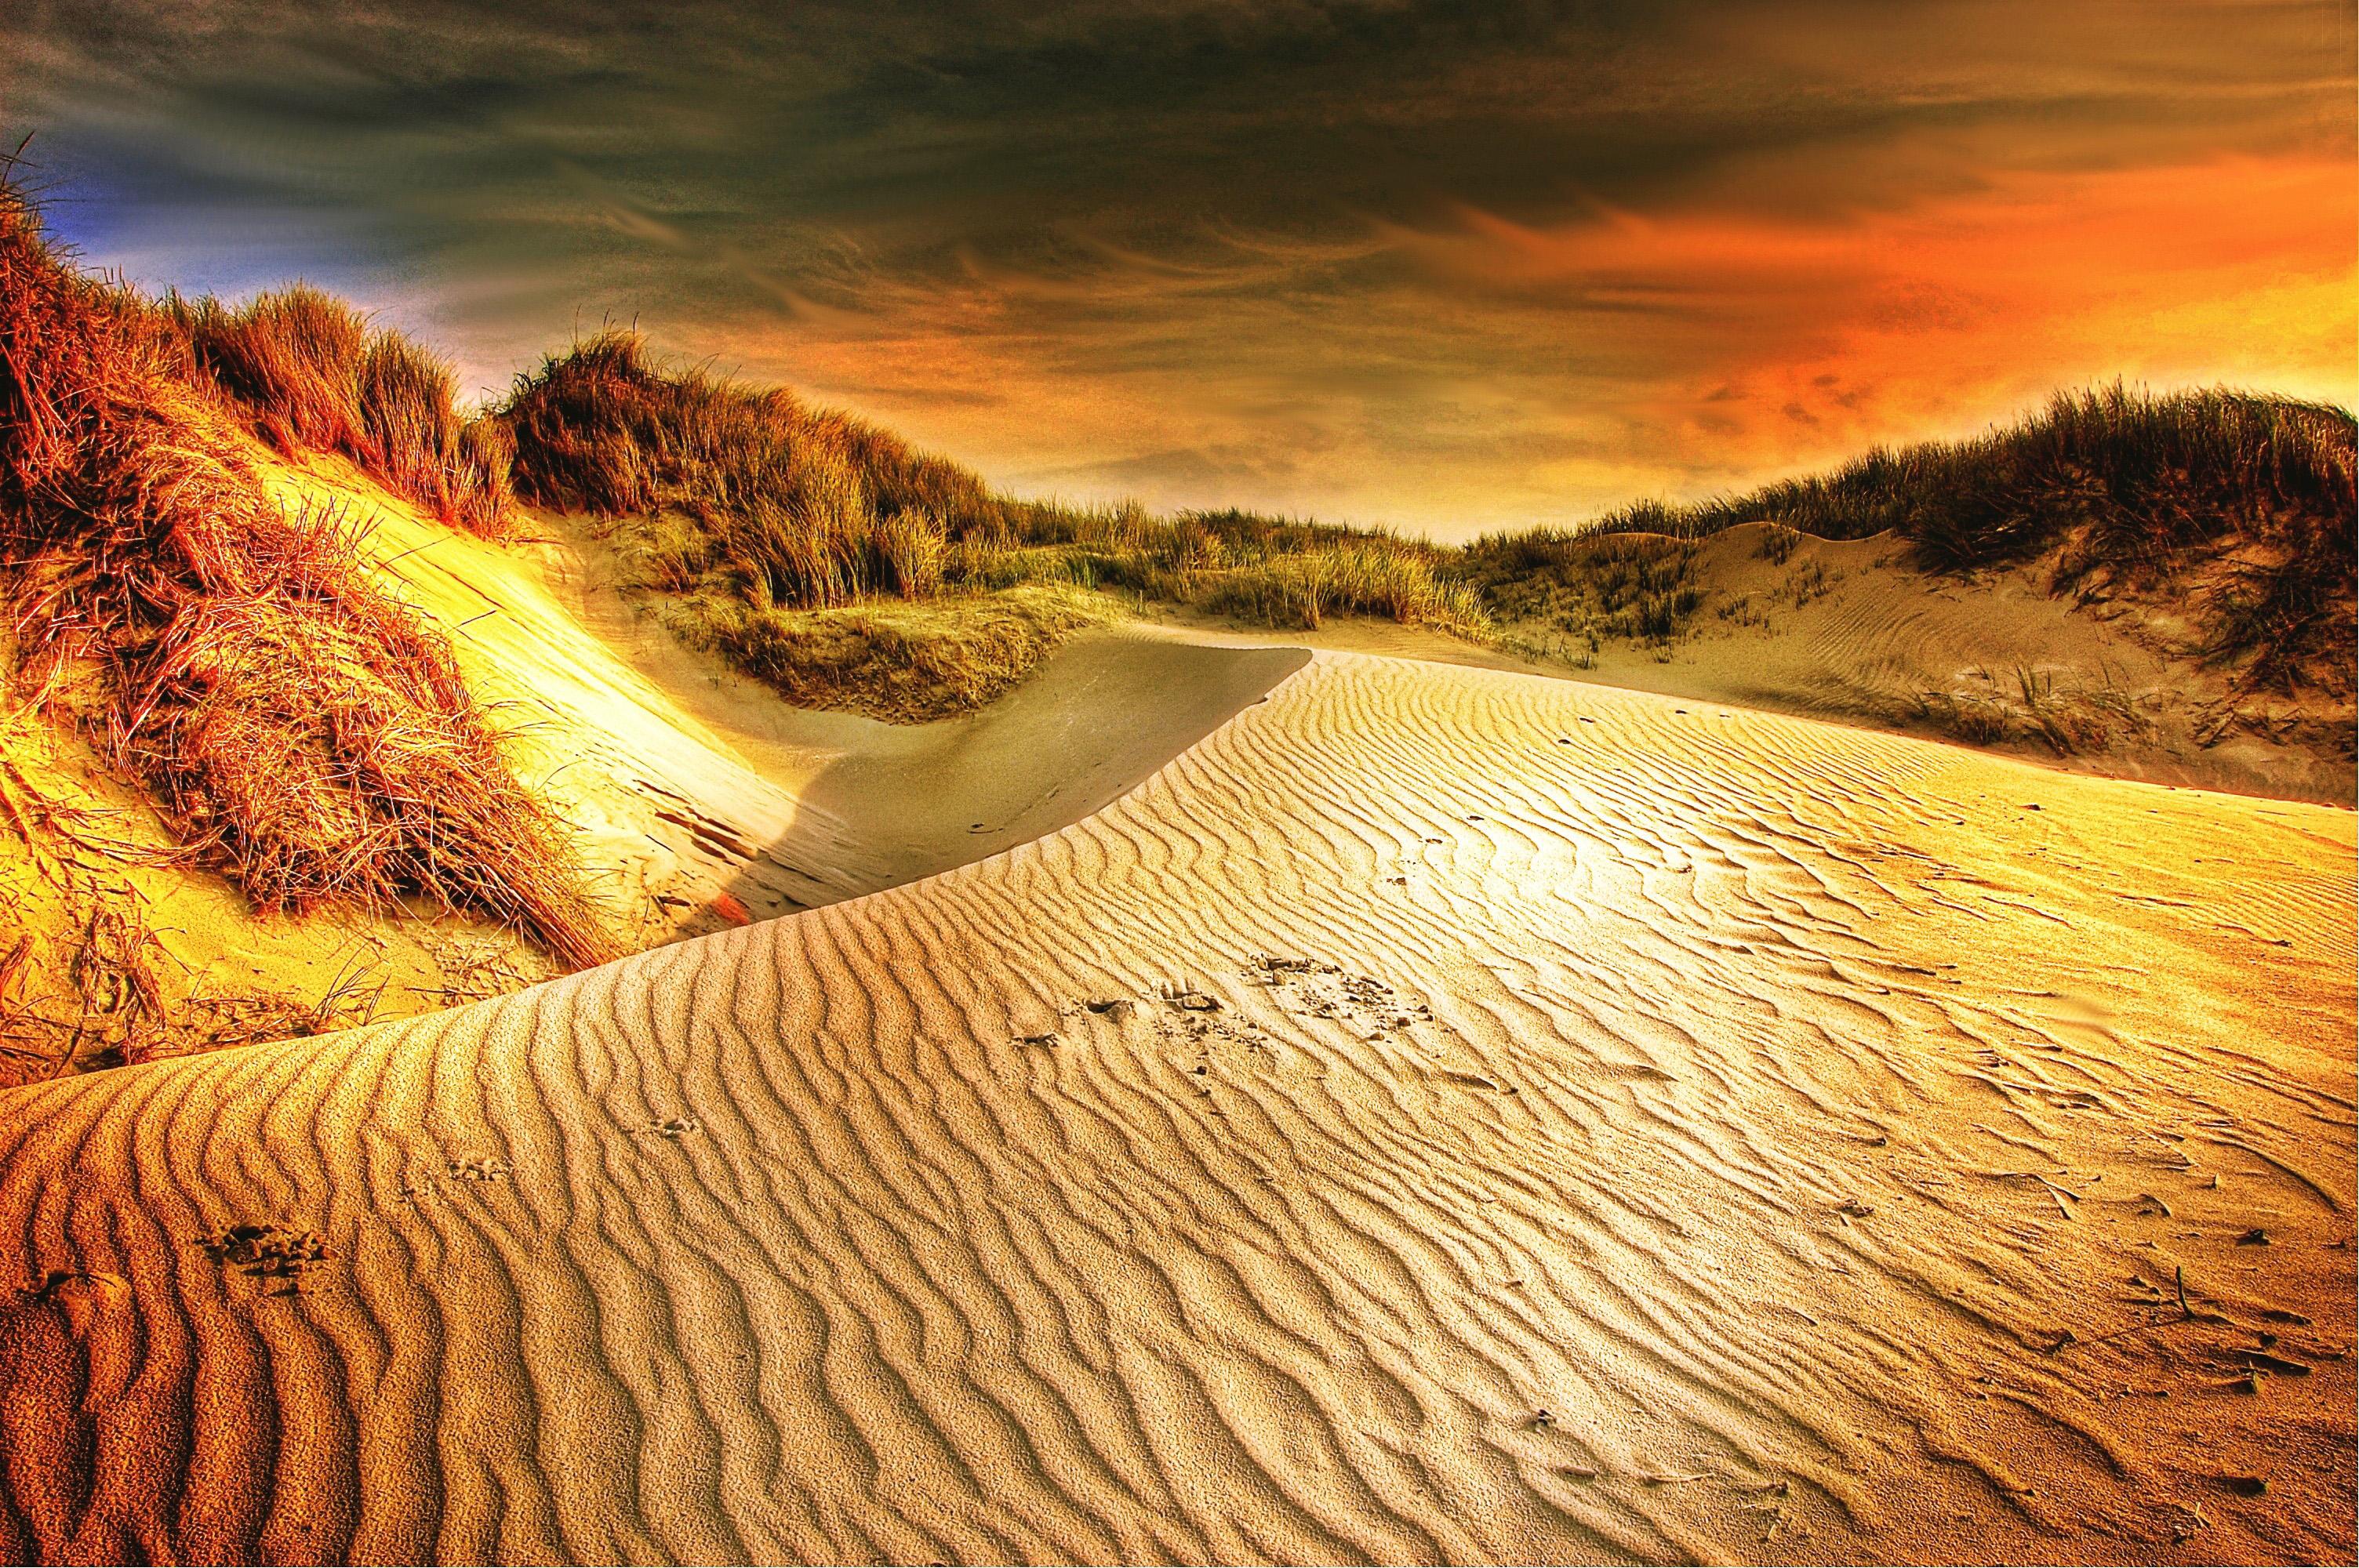 Desert Landscape Wallpaper Hd Desert And Sand Dunes Landscape Image Free Stock Photo